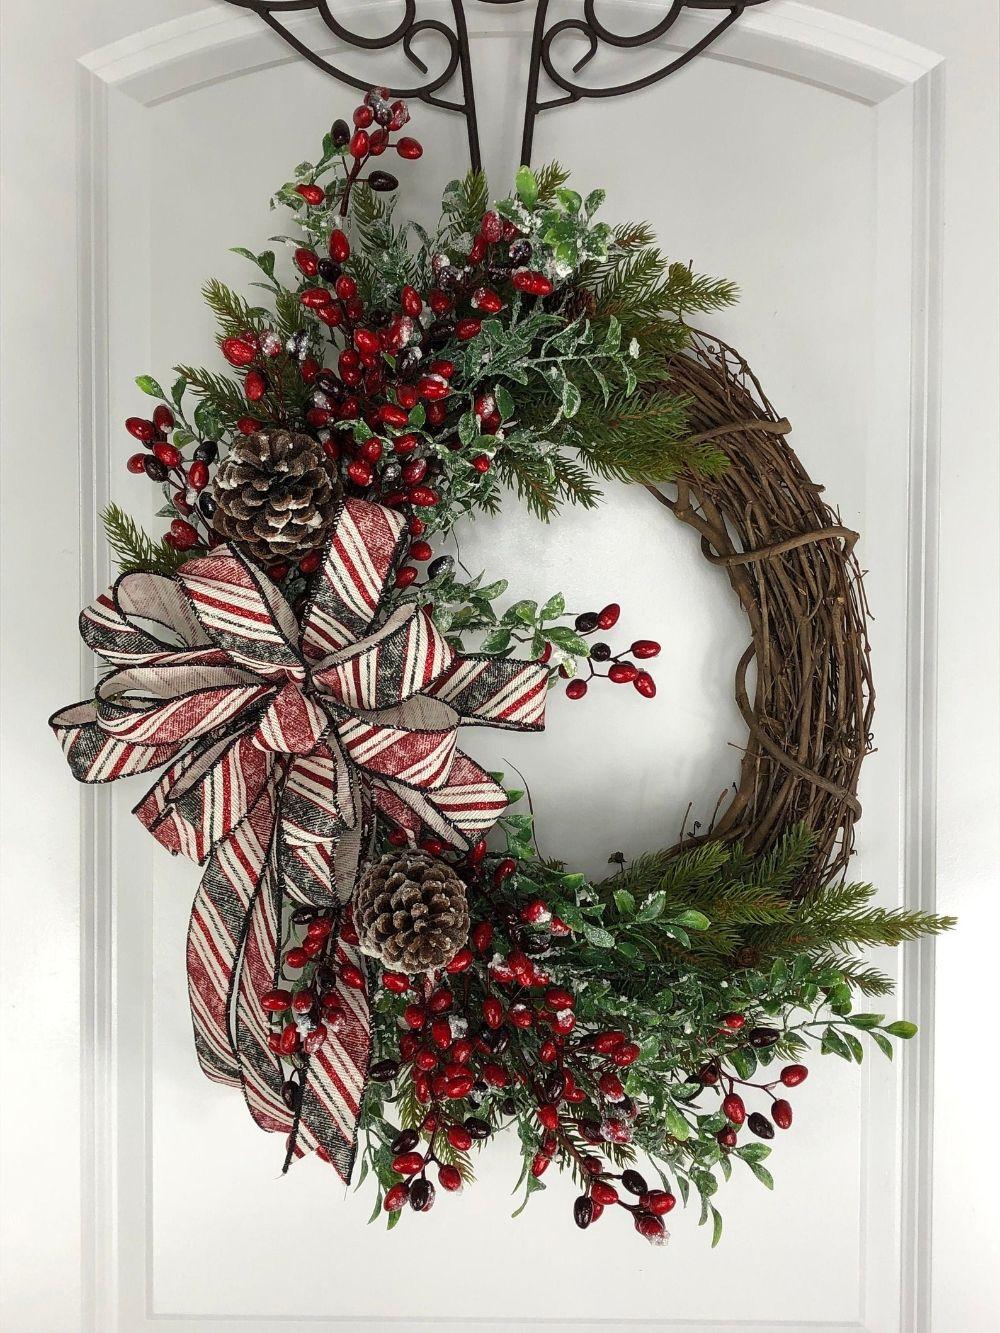 25 Unique Christmas Wreath Decors On The Door Decoarchi Com Christmas Wreaths Christmas Wreath Designs Winter Wreath